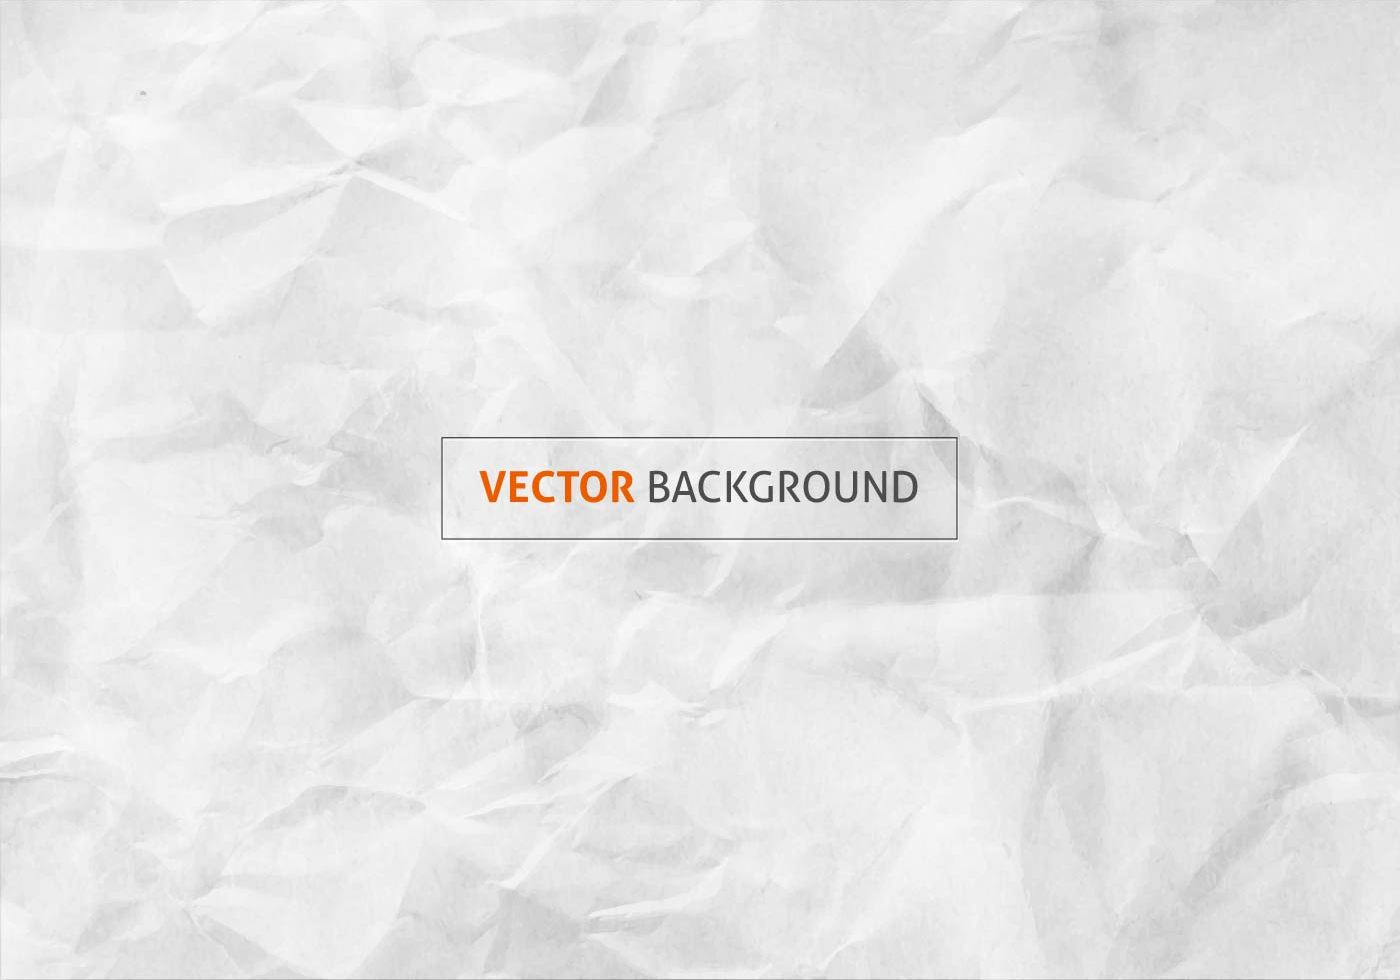 Textura vetorial livre de papel amassado - Download Vetores Gratis ...